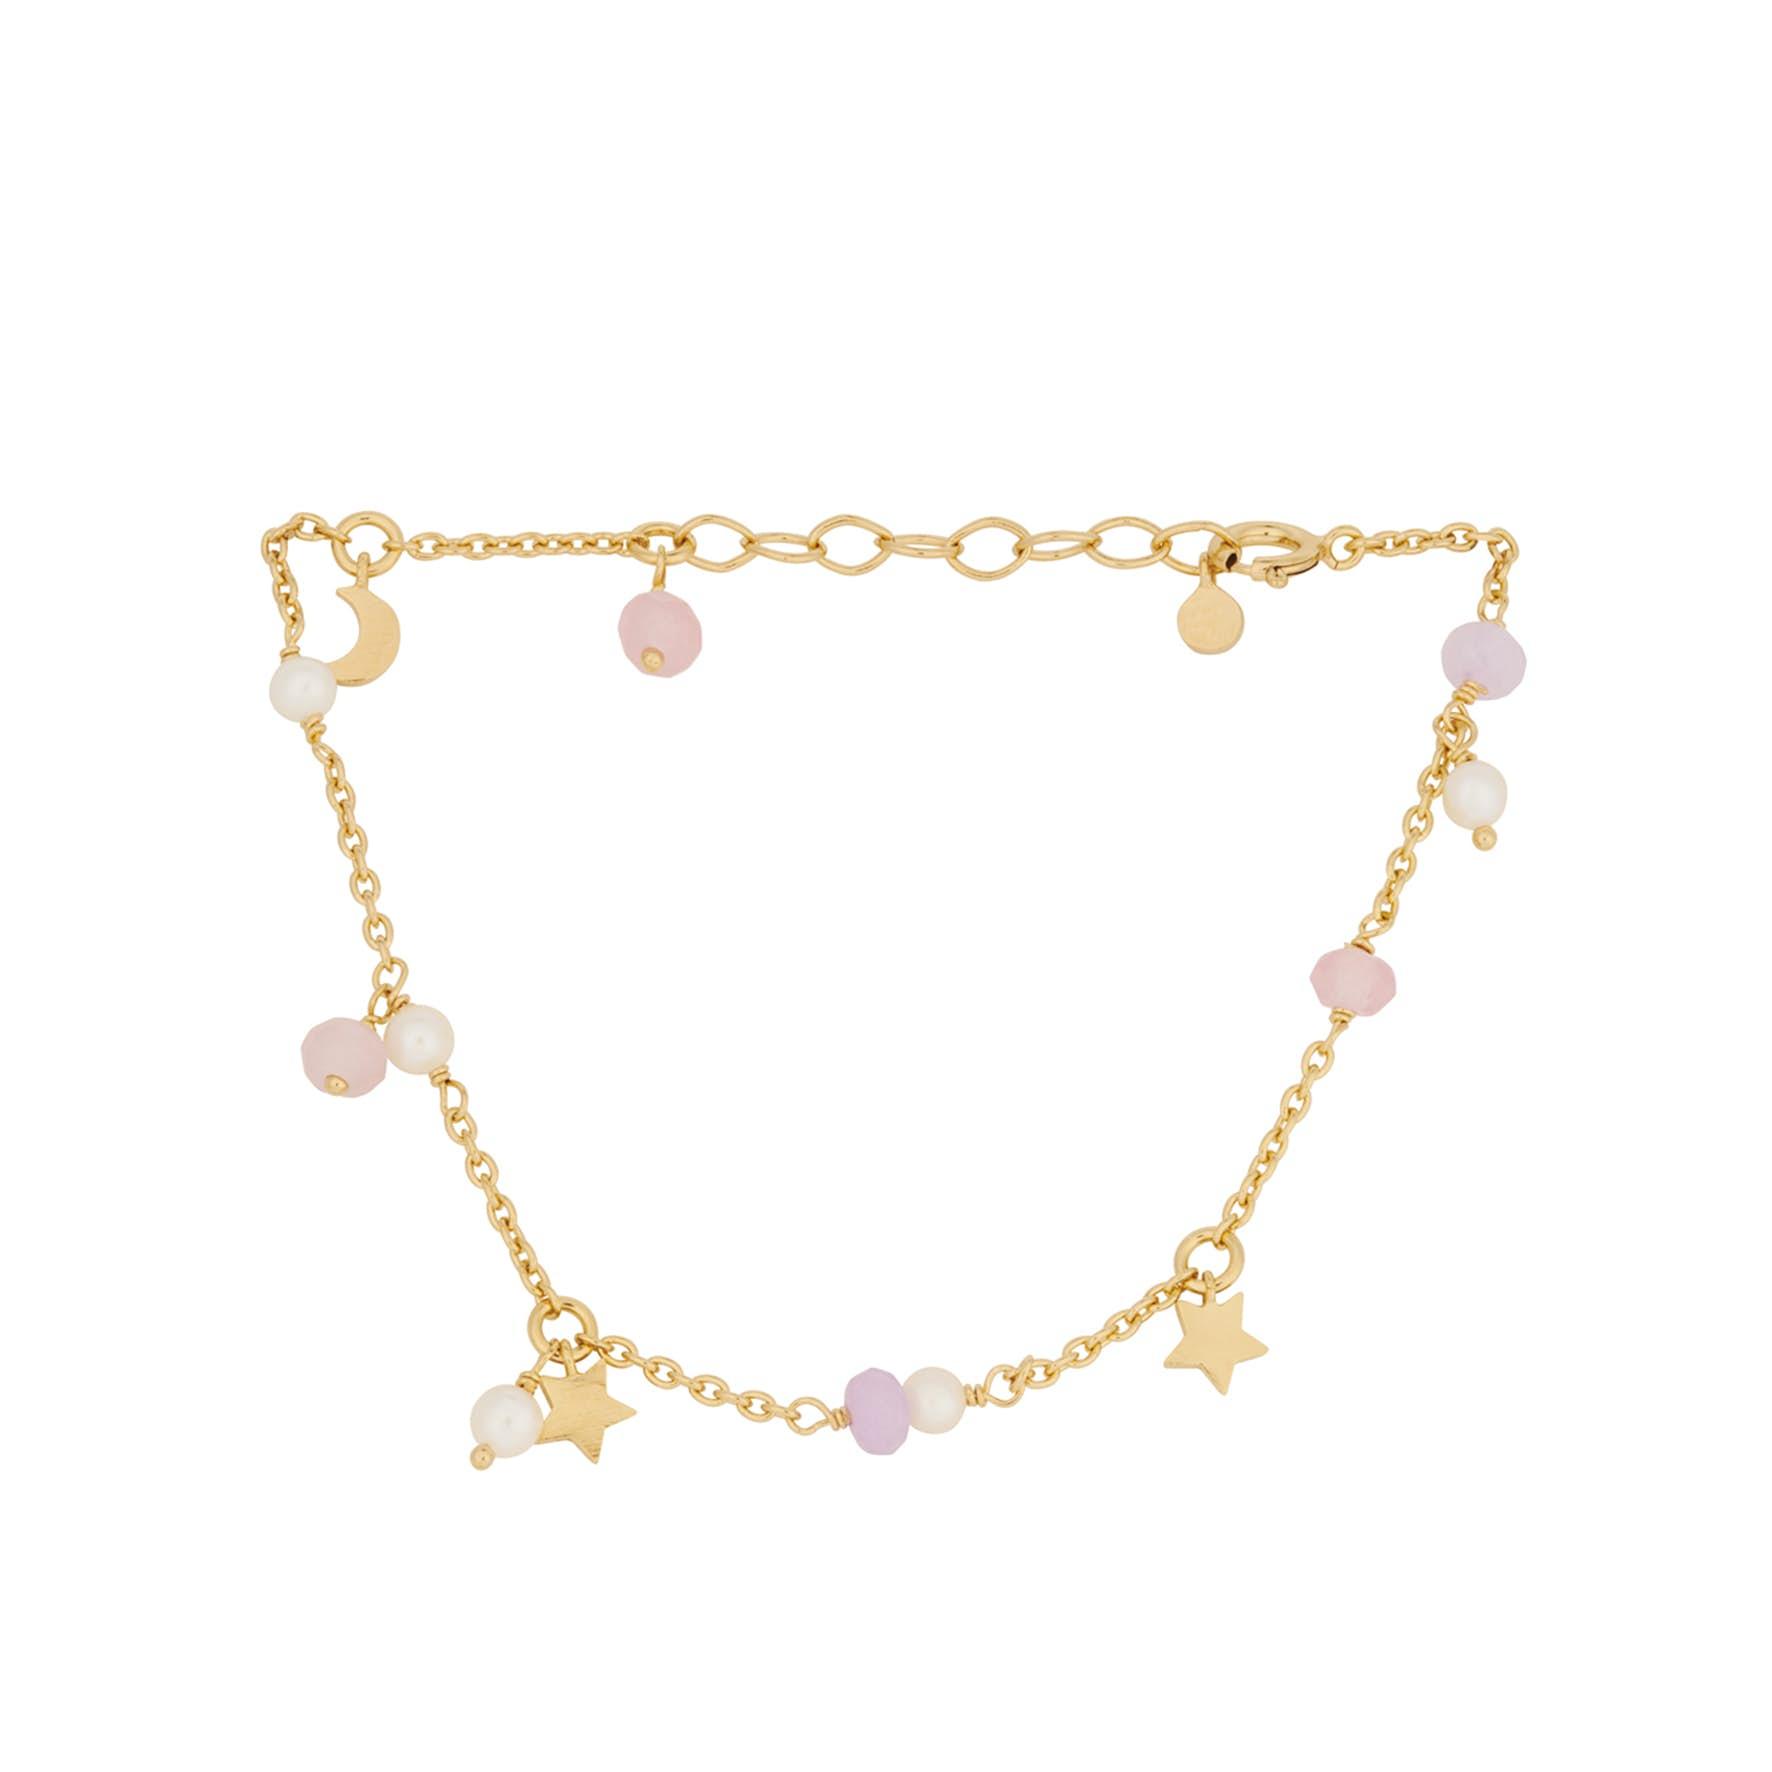 Pastel Dream Bracelet von Pernille Corydon in Vergoldet-Silber Sterling 925| Pink Agate, Purple Agate,Freshwater Pearl